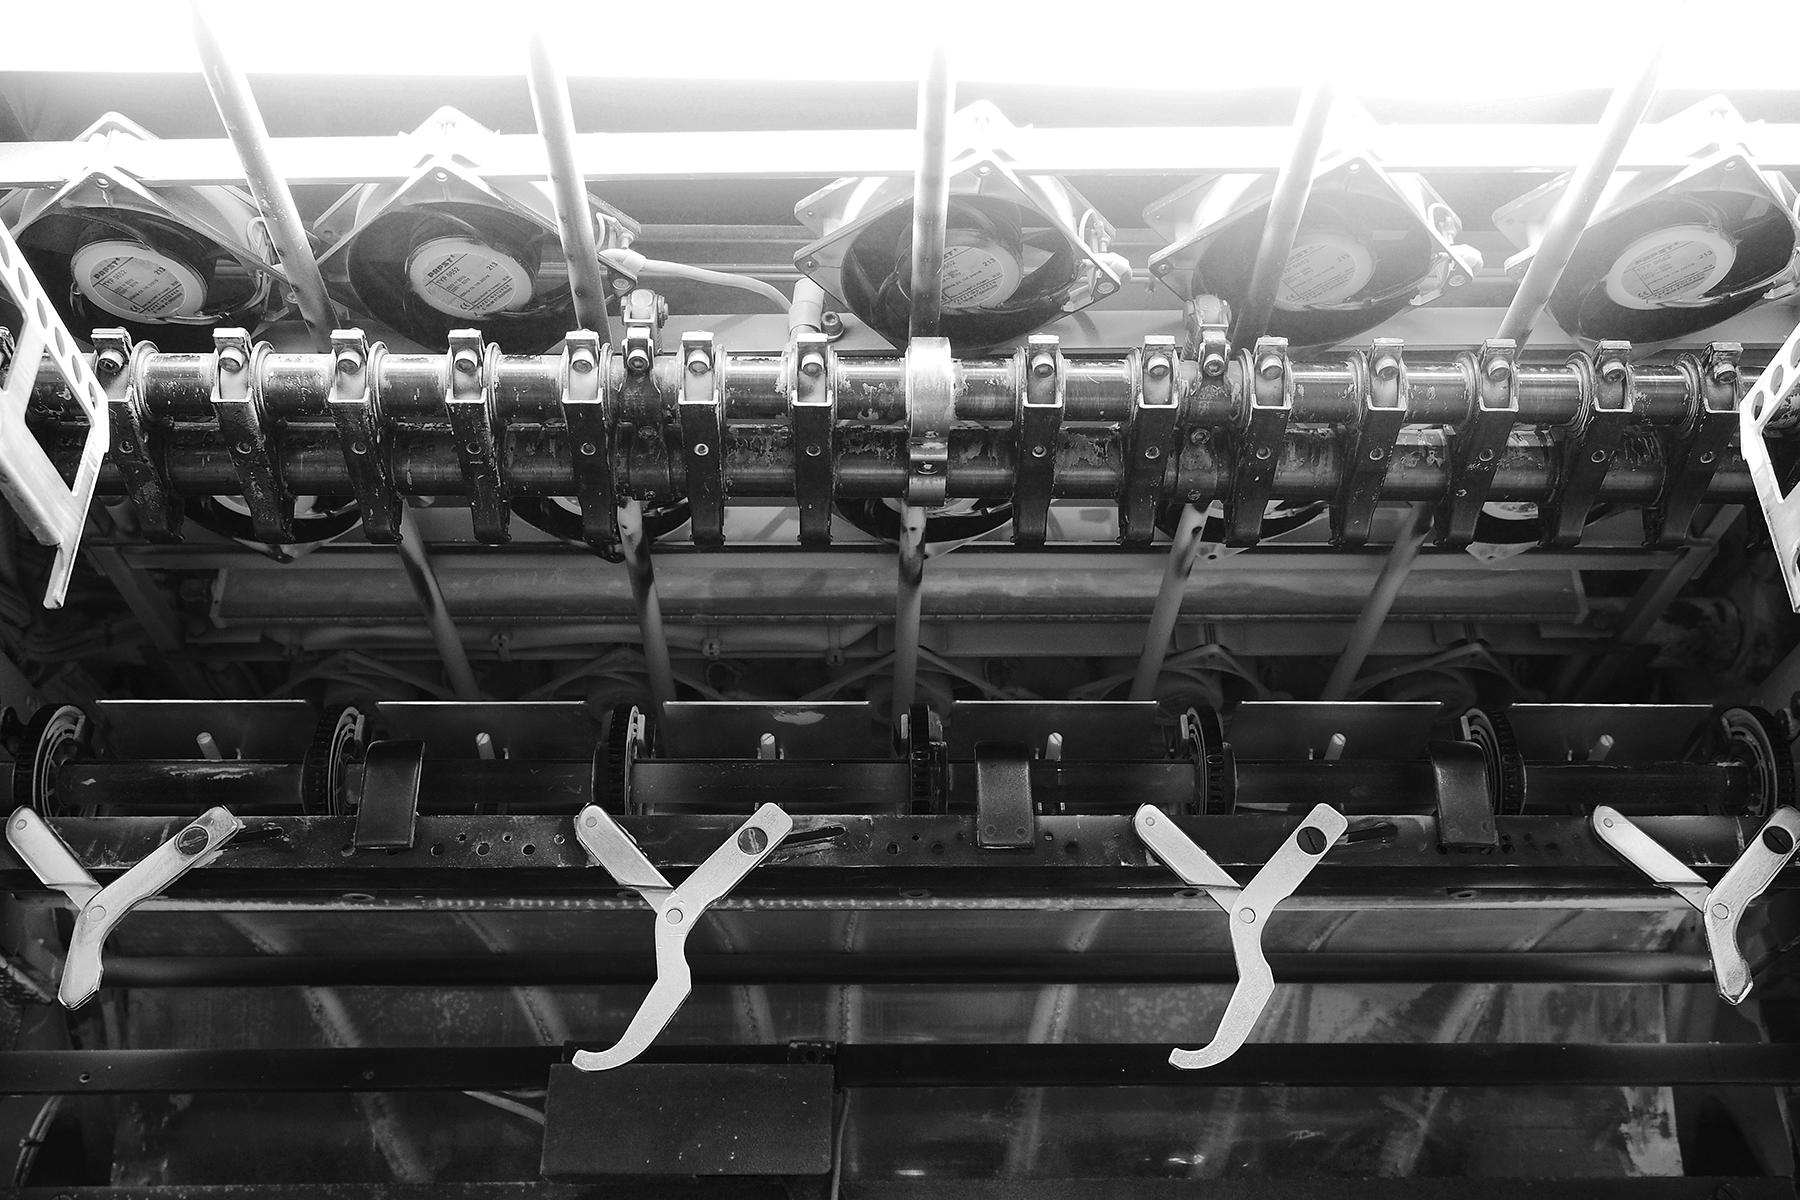 Imprimerie moutot - imprimeur - heidelberg